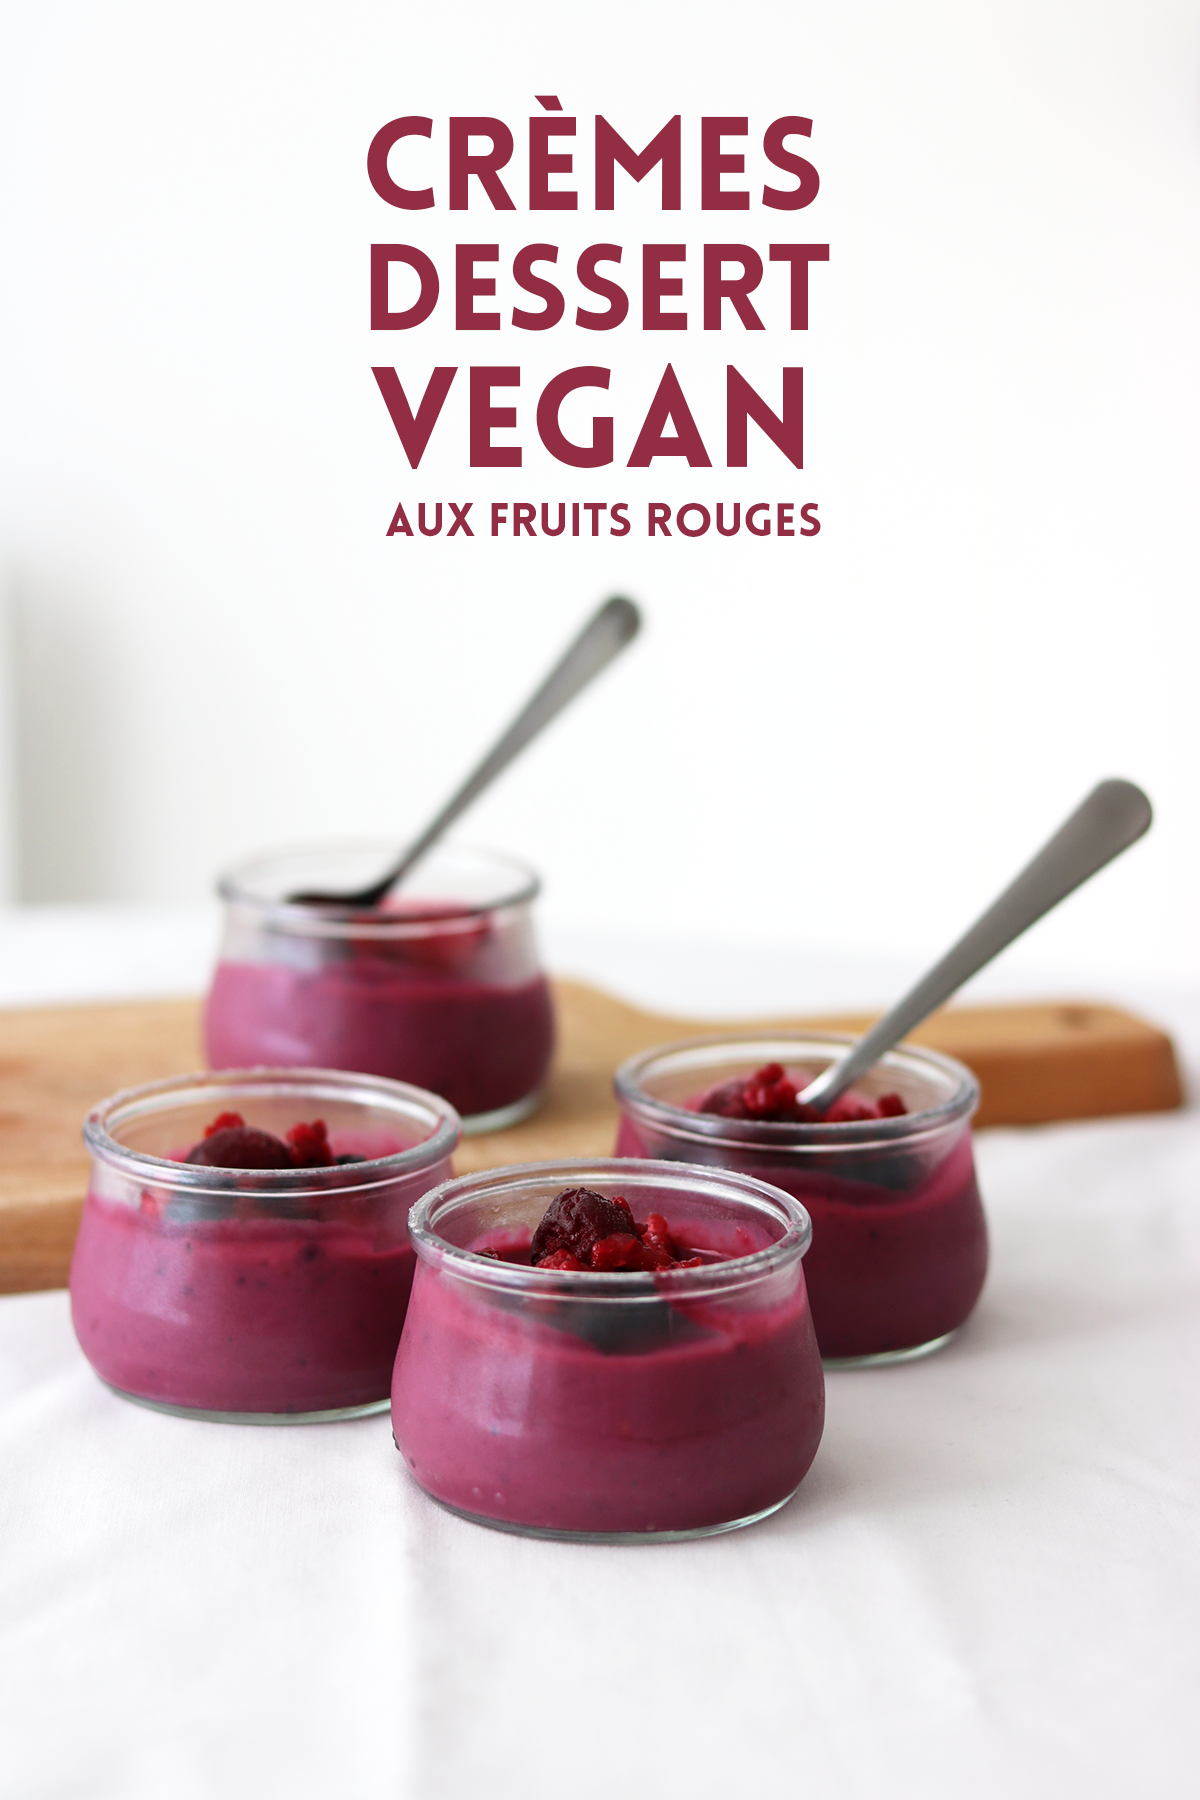 cremes dessert vegan fruits rouges pinterest